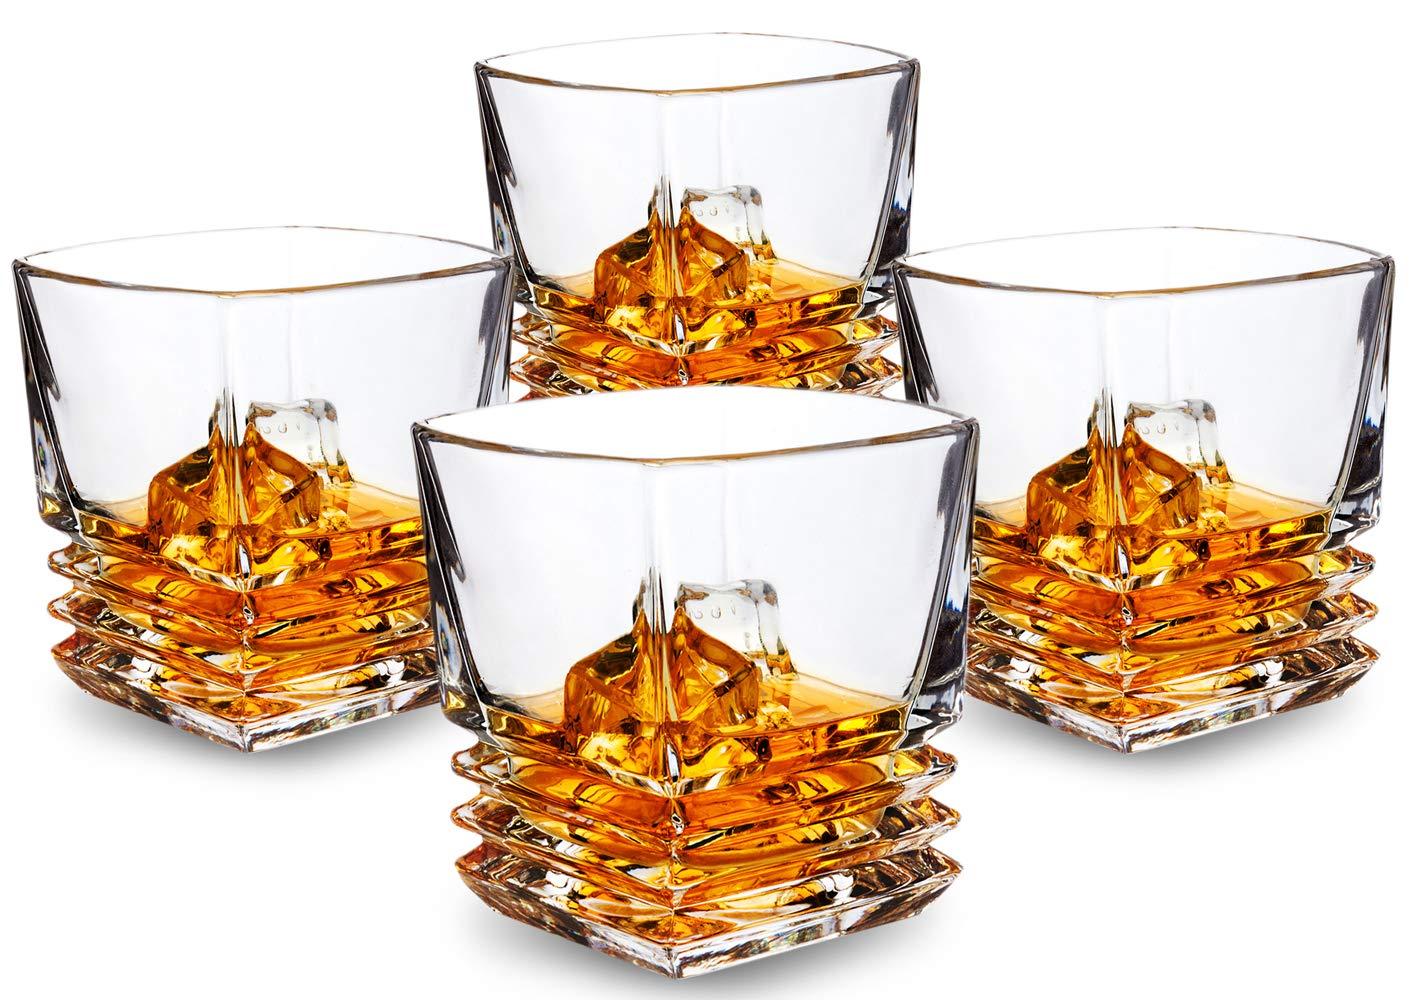 KANARS Pacific Whiskey Glasses set of 4. Premium Lead Free Crystal Rocks Tumblers for Bourbon Tasting or Scotch Drinking. Dishwasher Safe